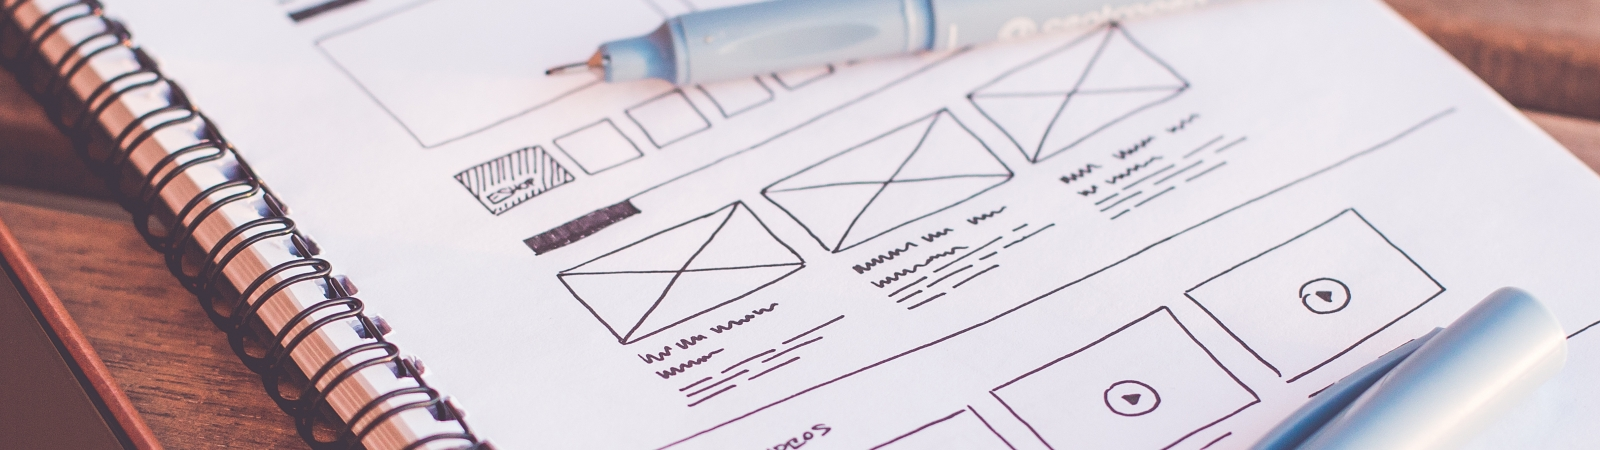 Best Practices for Responsive Design